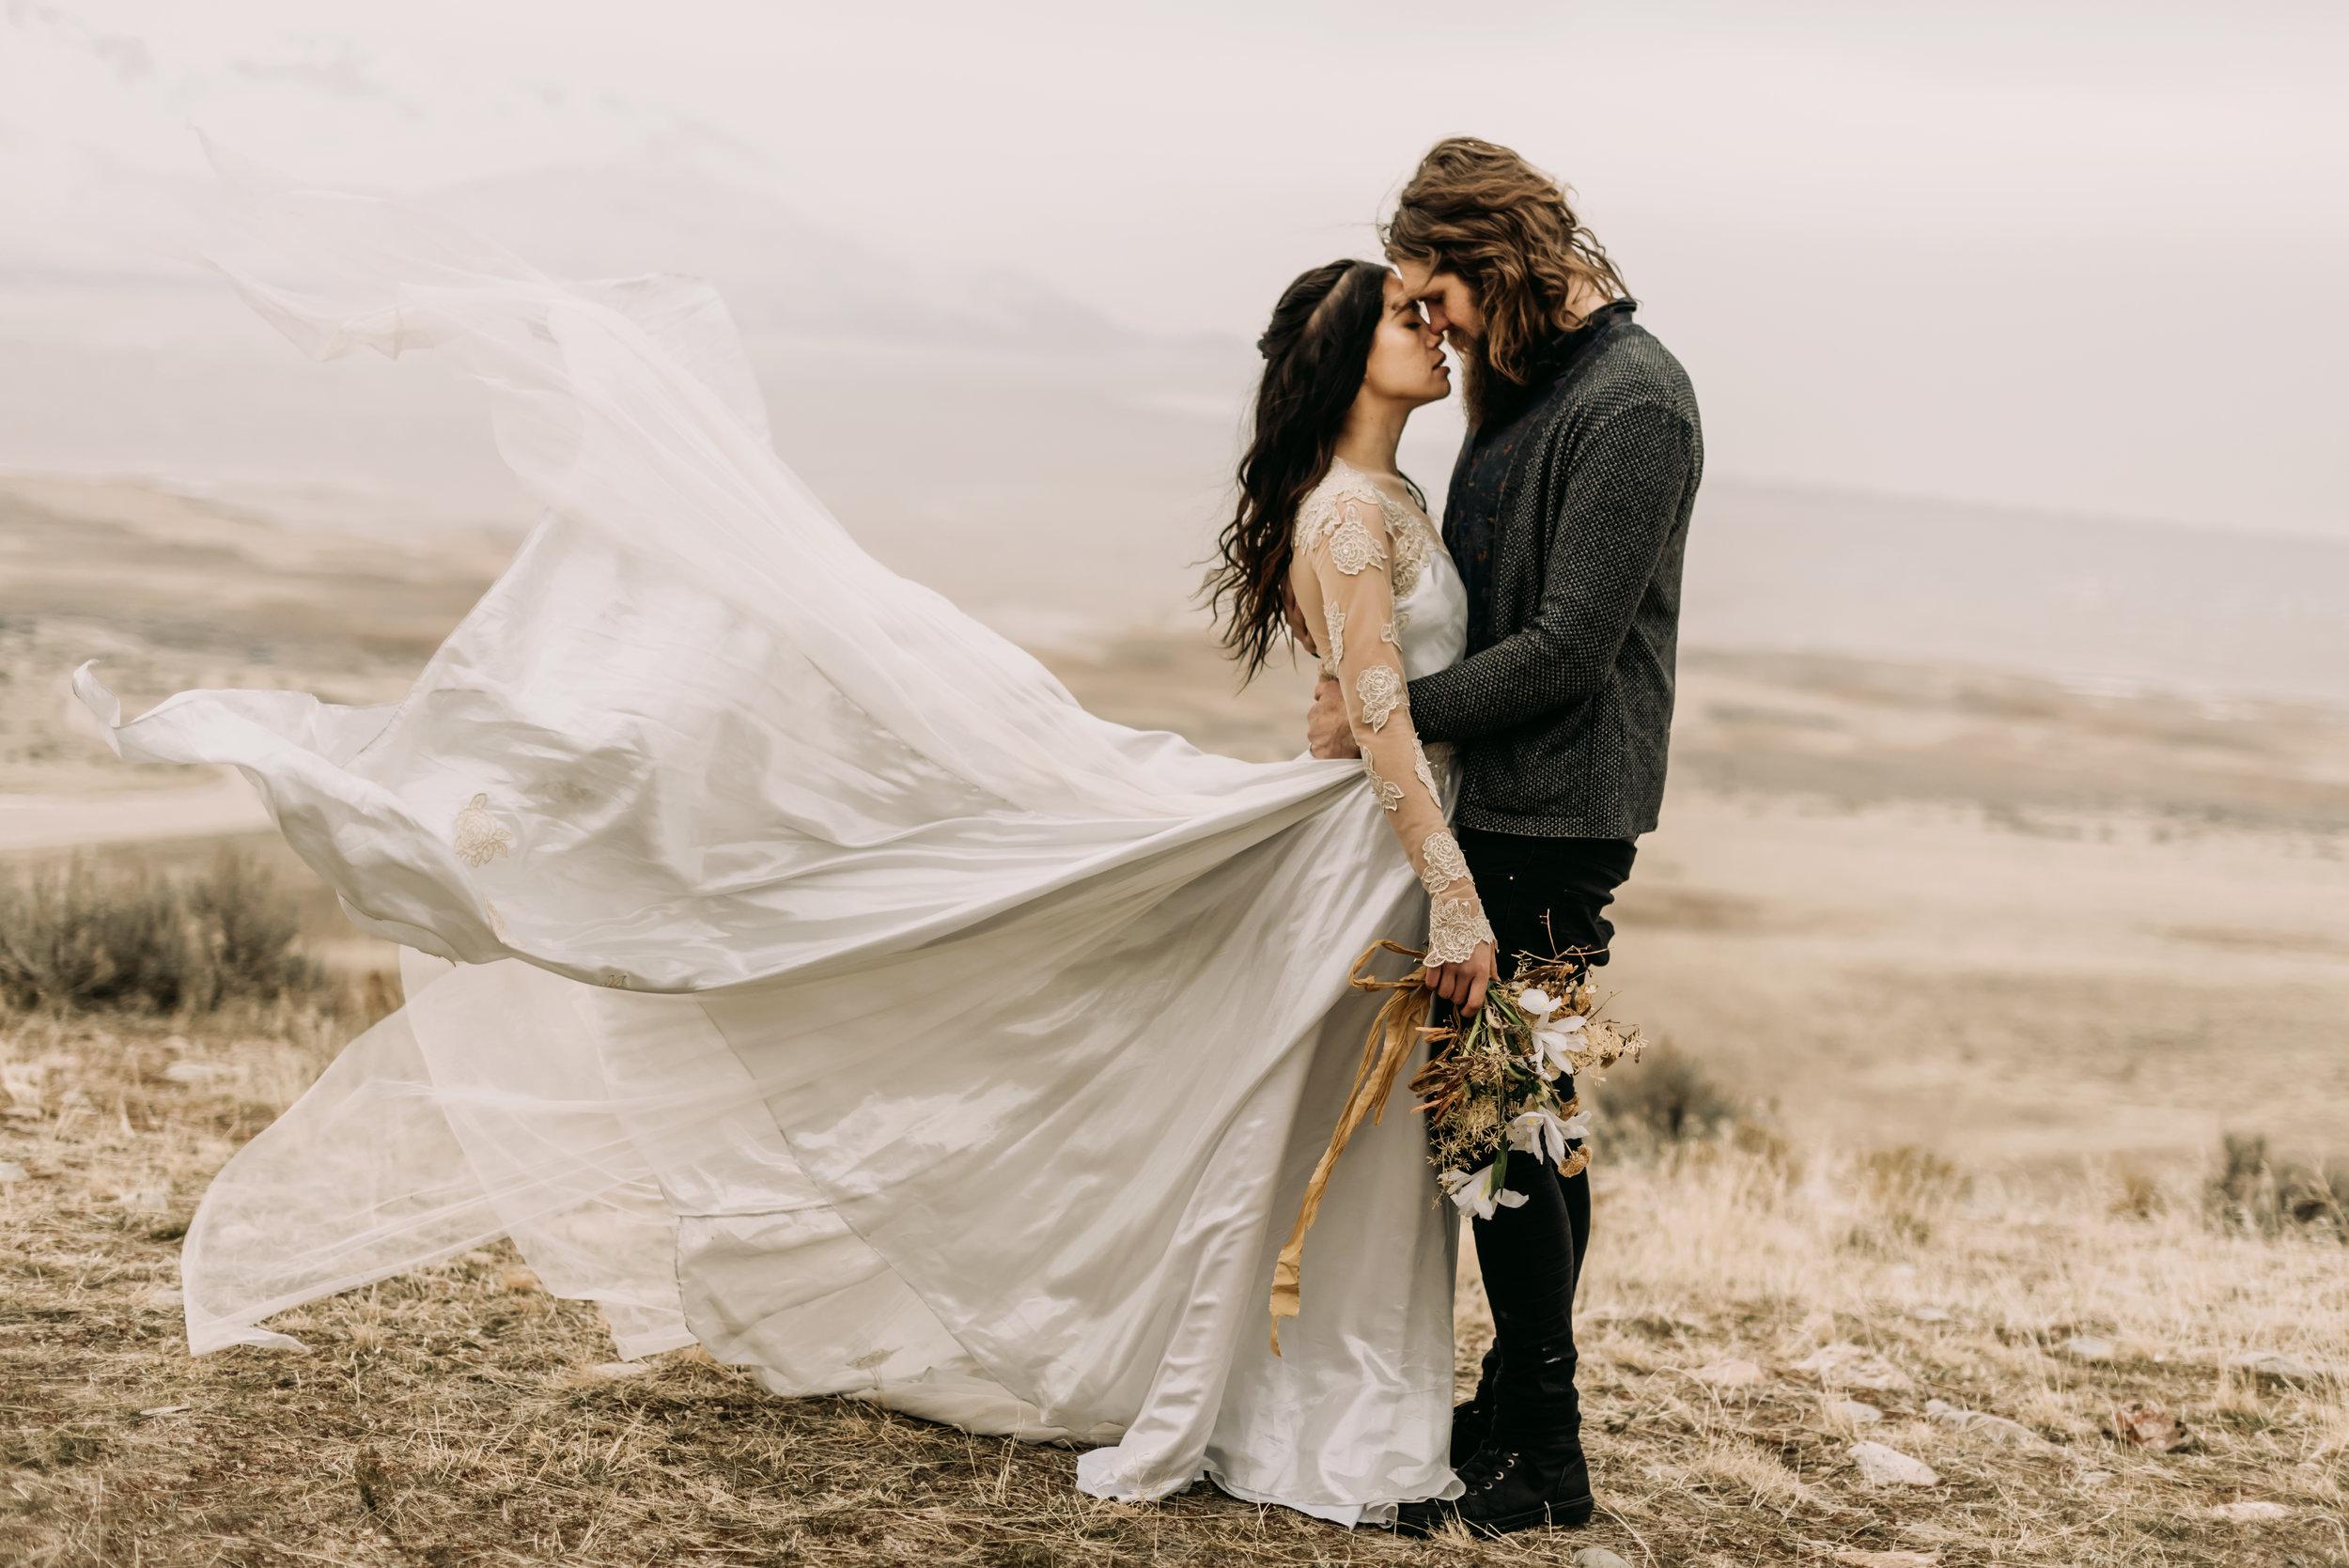 breelle_hilsenrath_photography_colorado_elopement_photographer.jpg